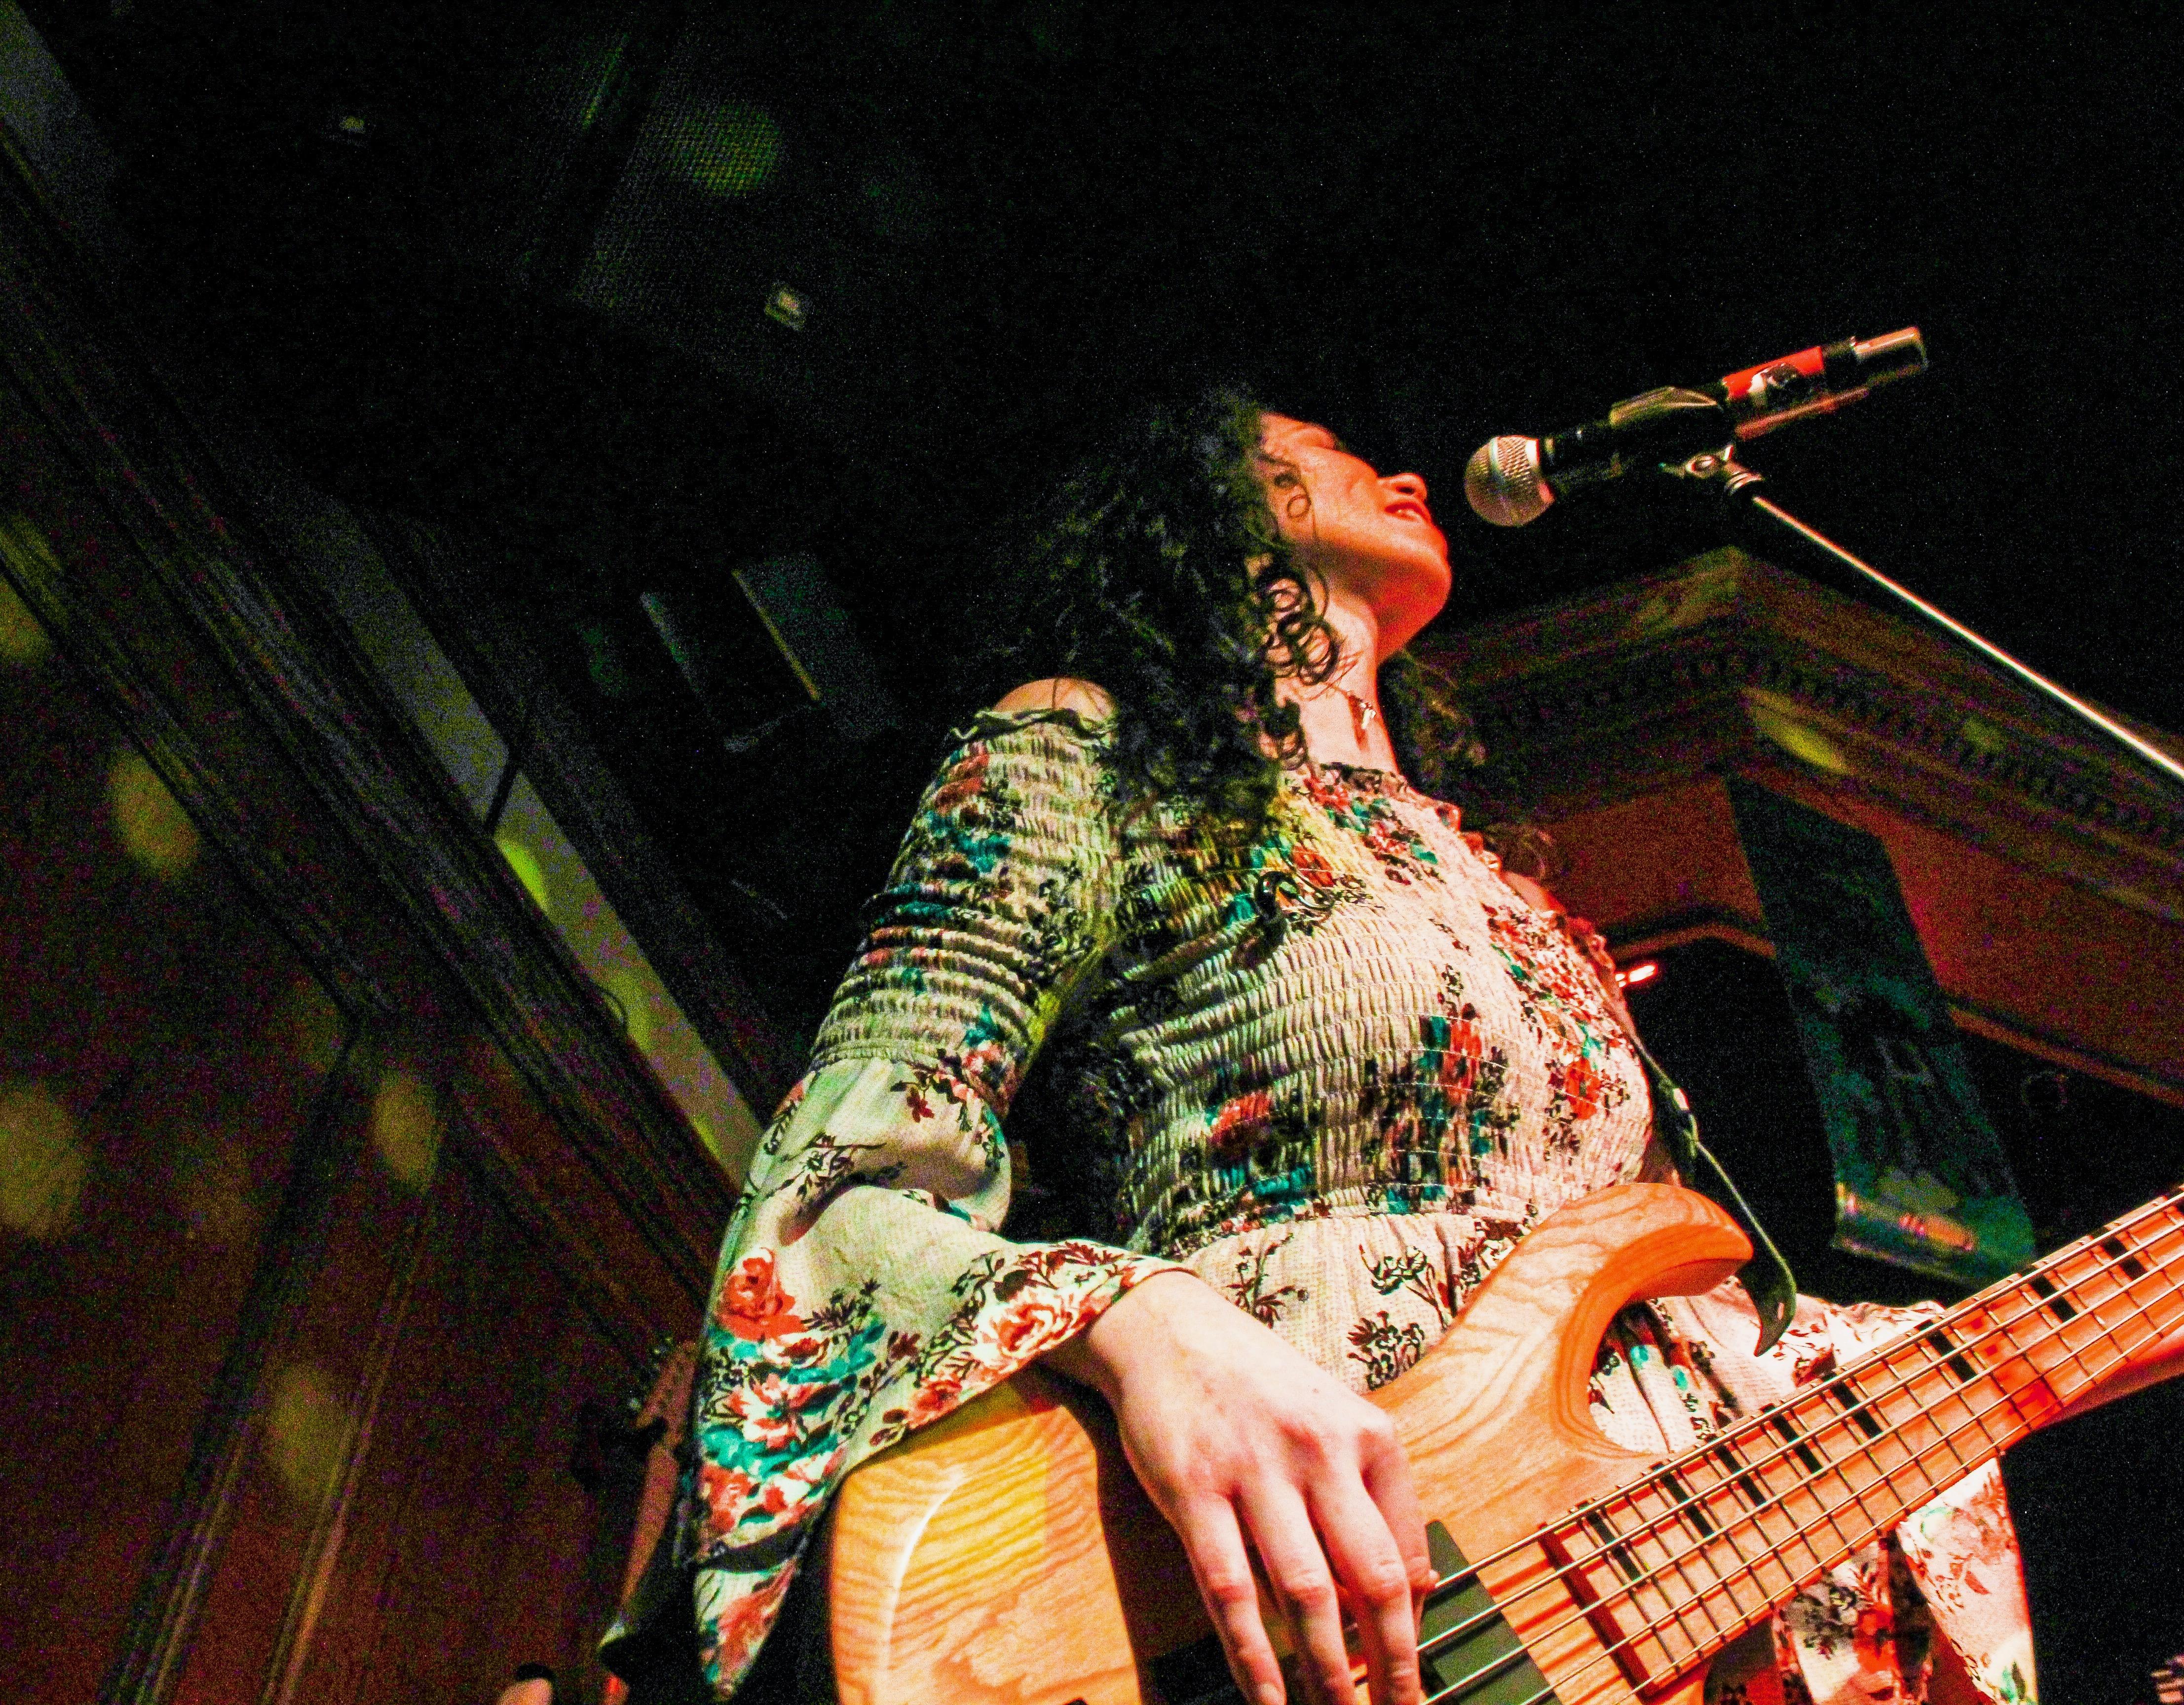 Musician Natalie Rogers